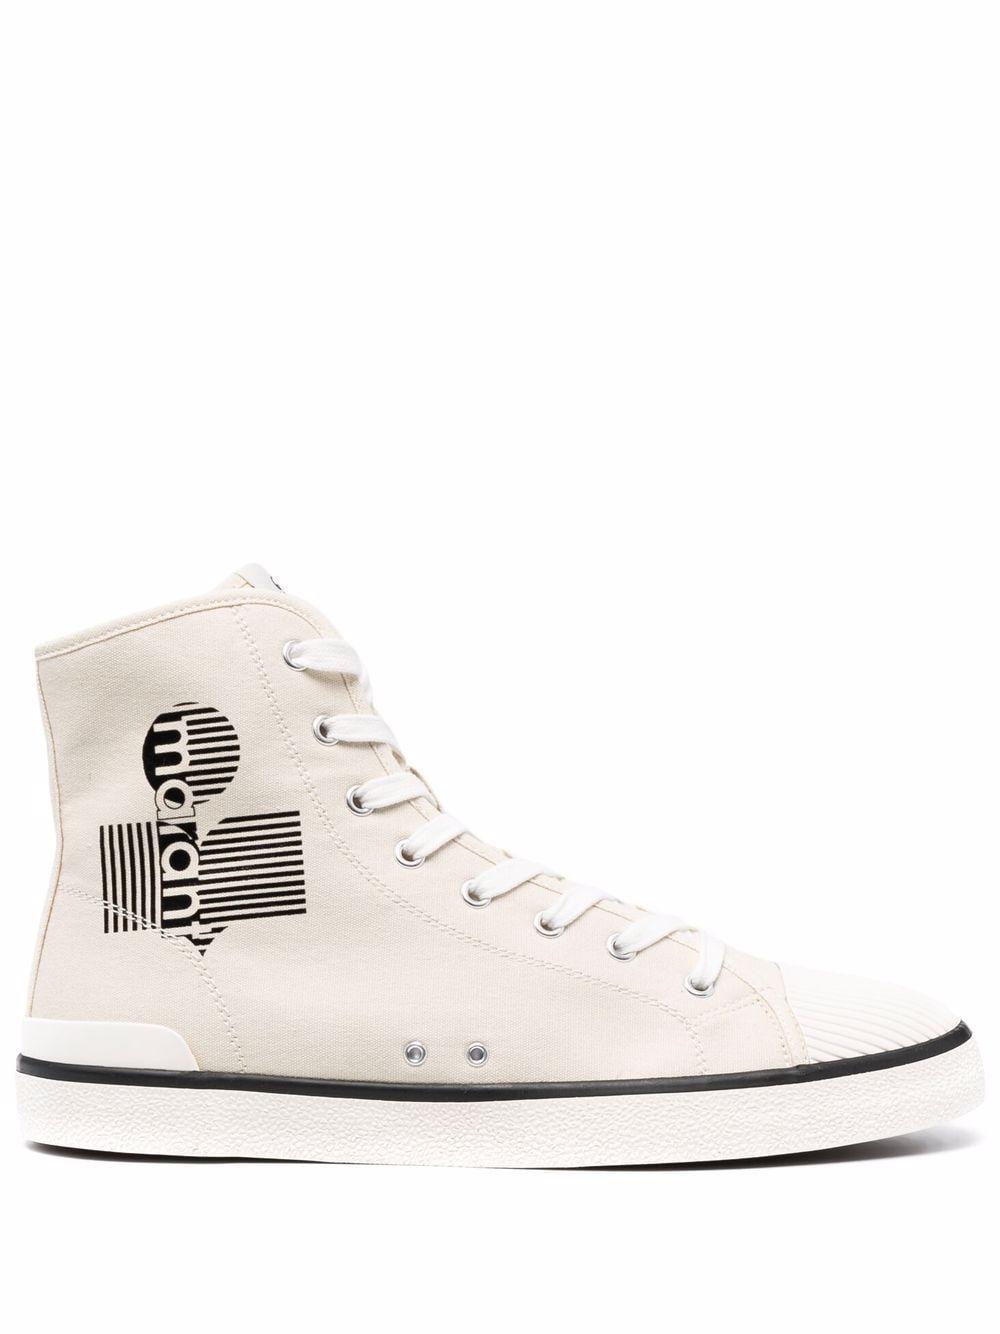 Isabel marant sneakers nero